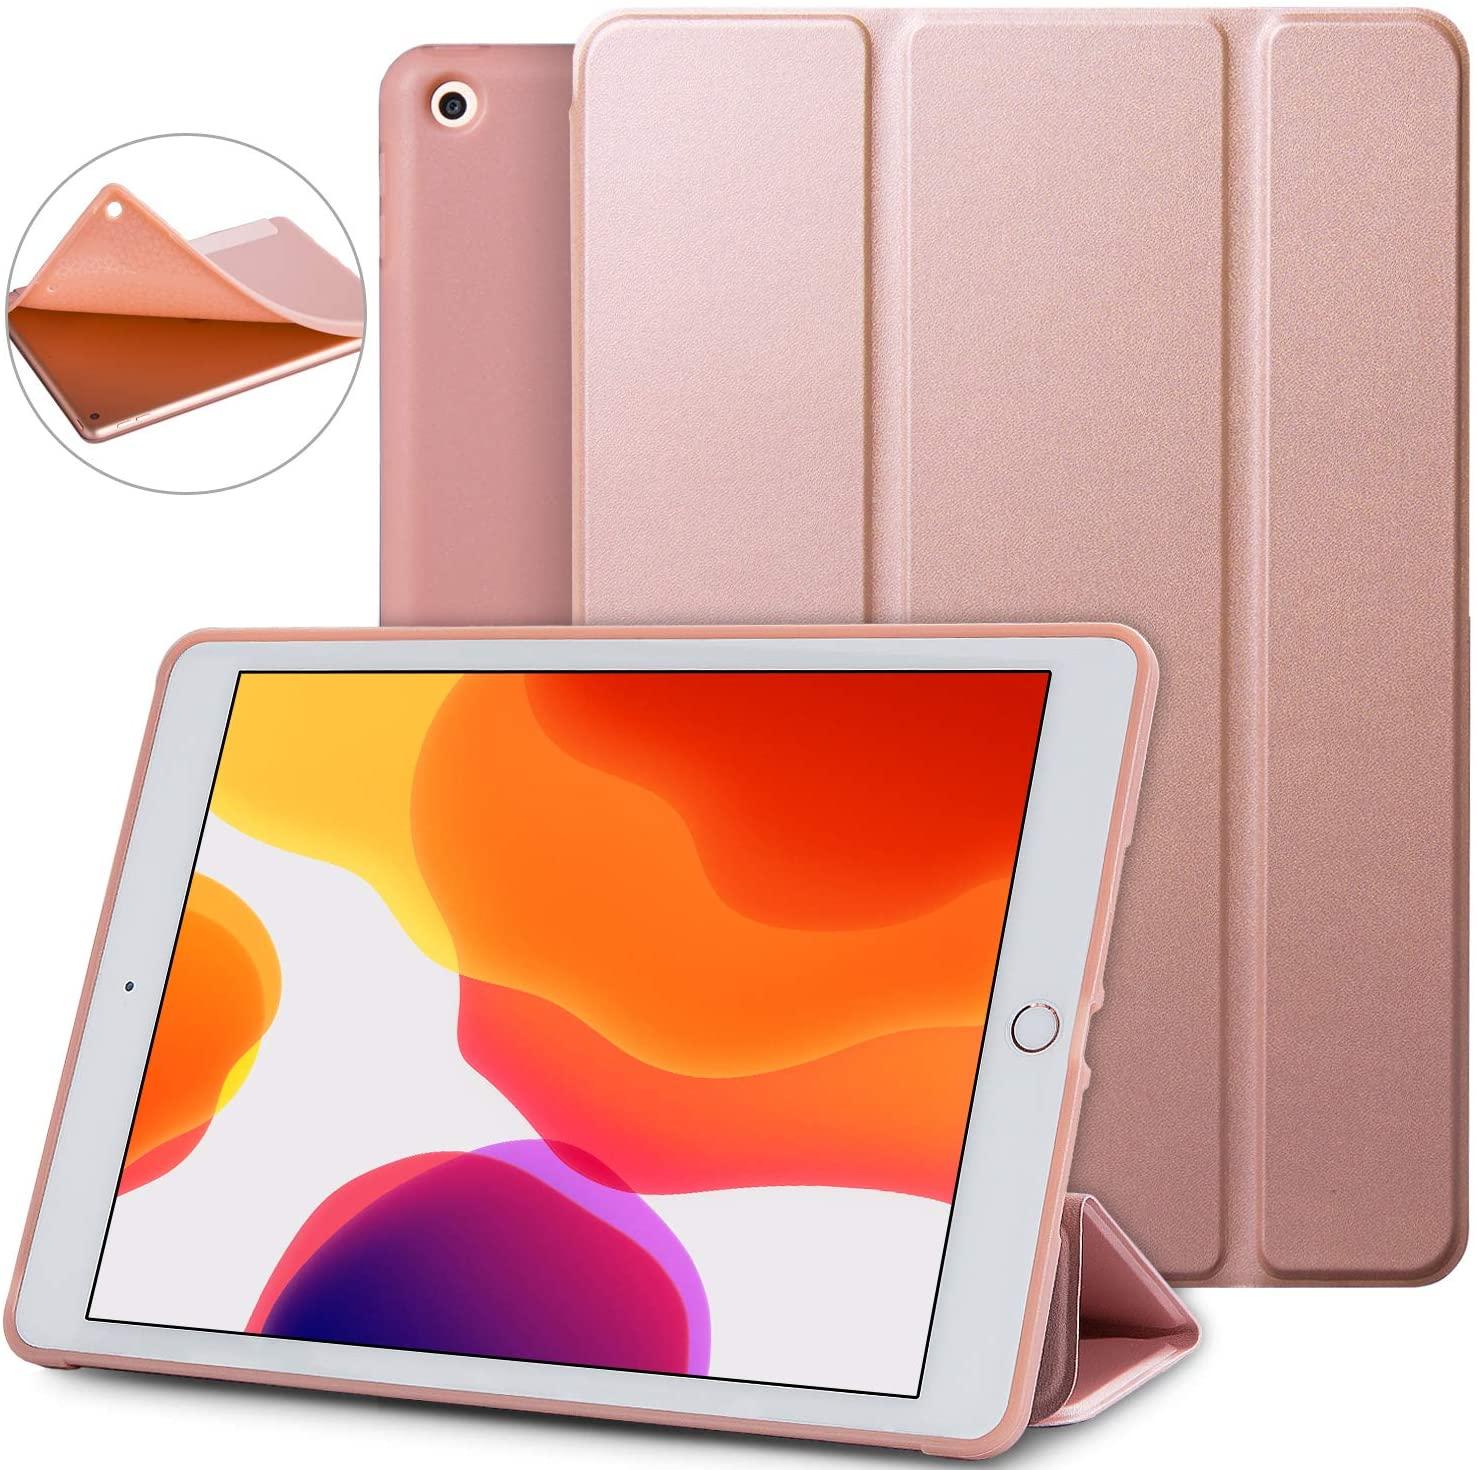 Soke iPad 7th Generation Case,New iPad 10.2 Case 2019,iPad case Lightweight Smart Cover with Soft TPU Back, Auto Sleep/Wake for iPad 7th Gen 2019(Rose Gold)